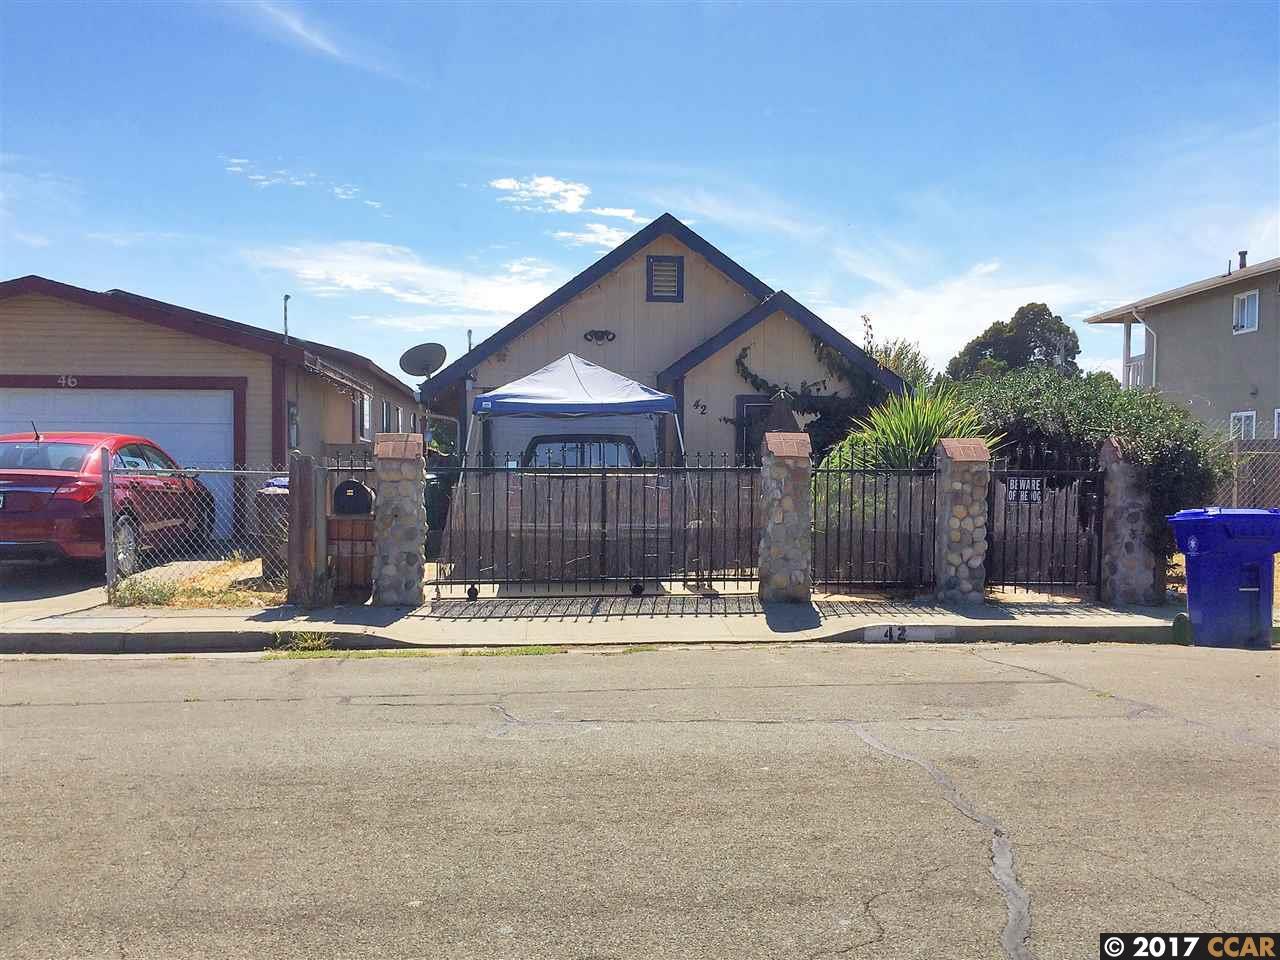 42 CHESLEY AVE, RICHMOND, CA 94801